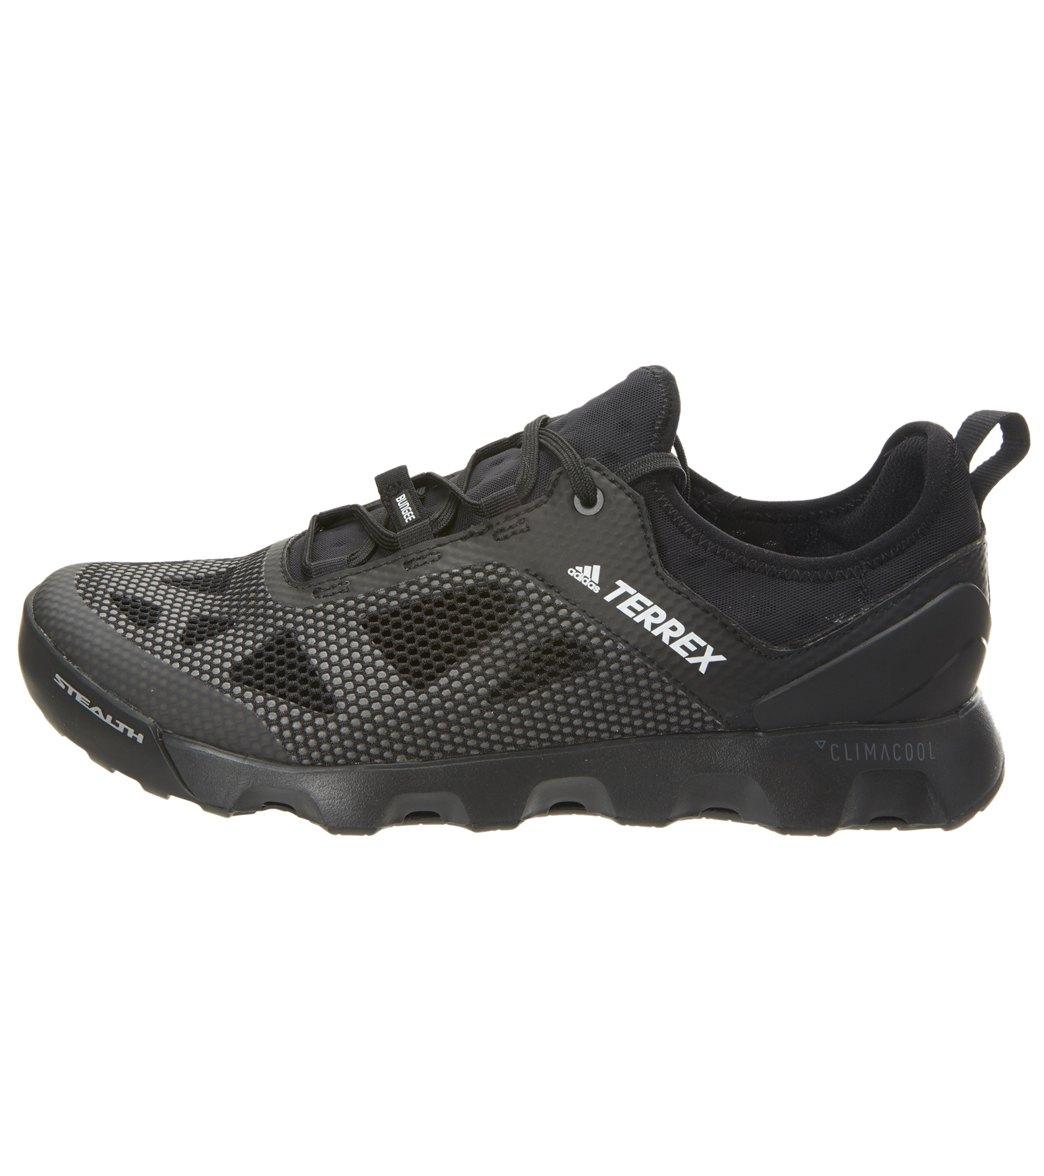 8137e23471ac Adidas Men s Terrex Climacool Voyager Aqua Water Shoe at SwimOutlet ...